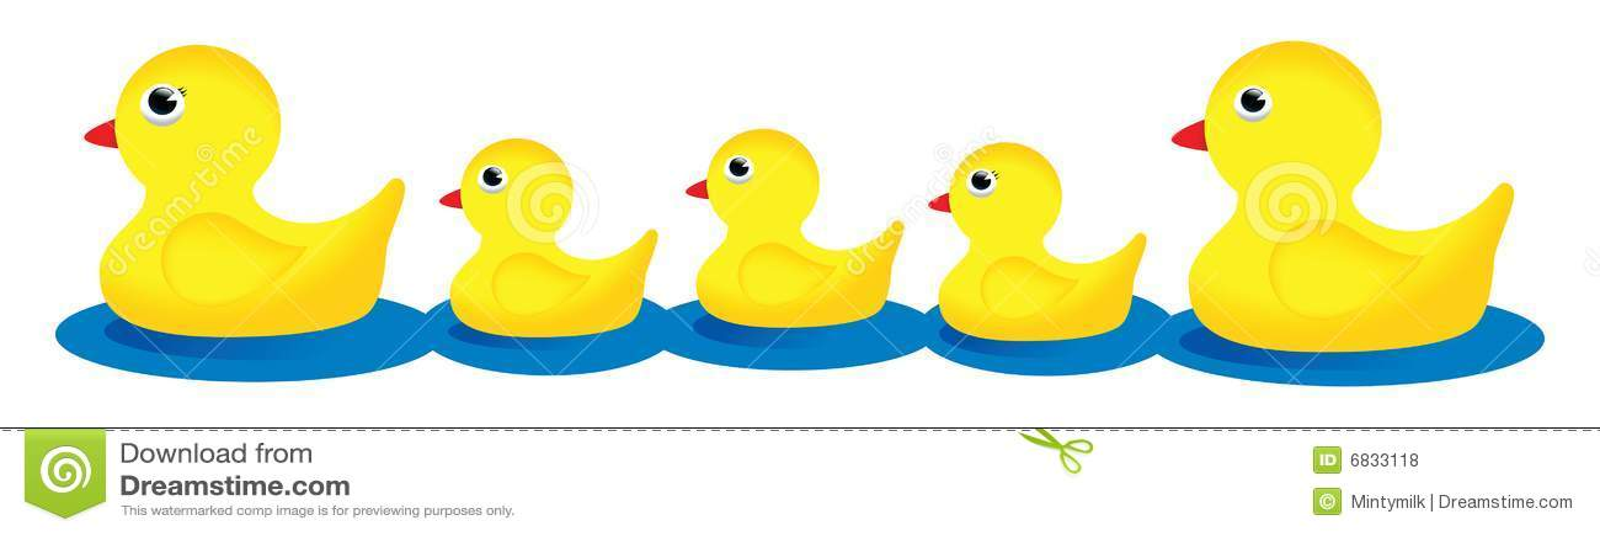 Fall Wallpaper Border Rubber Duck Family Stock Illustration Illustration Of